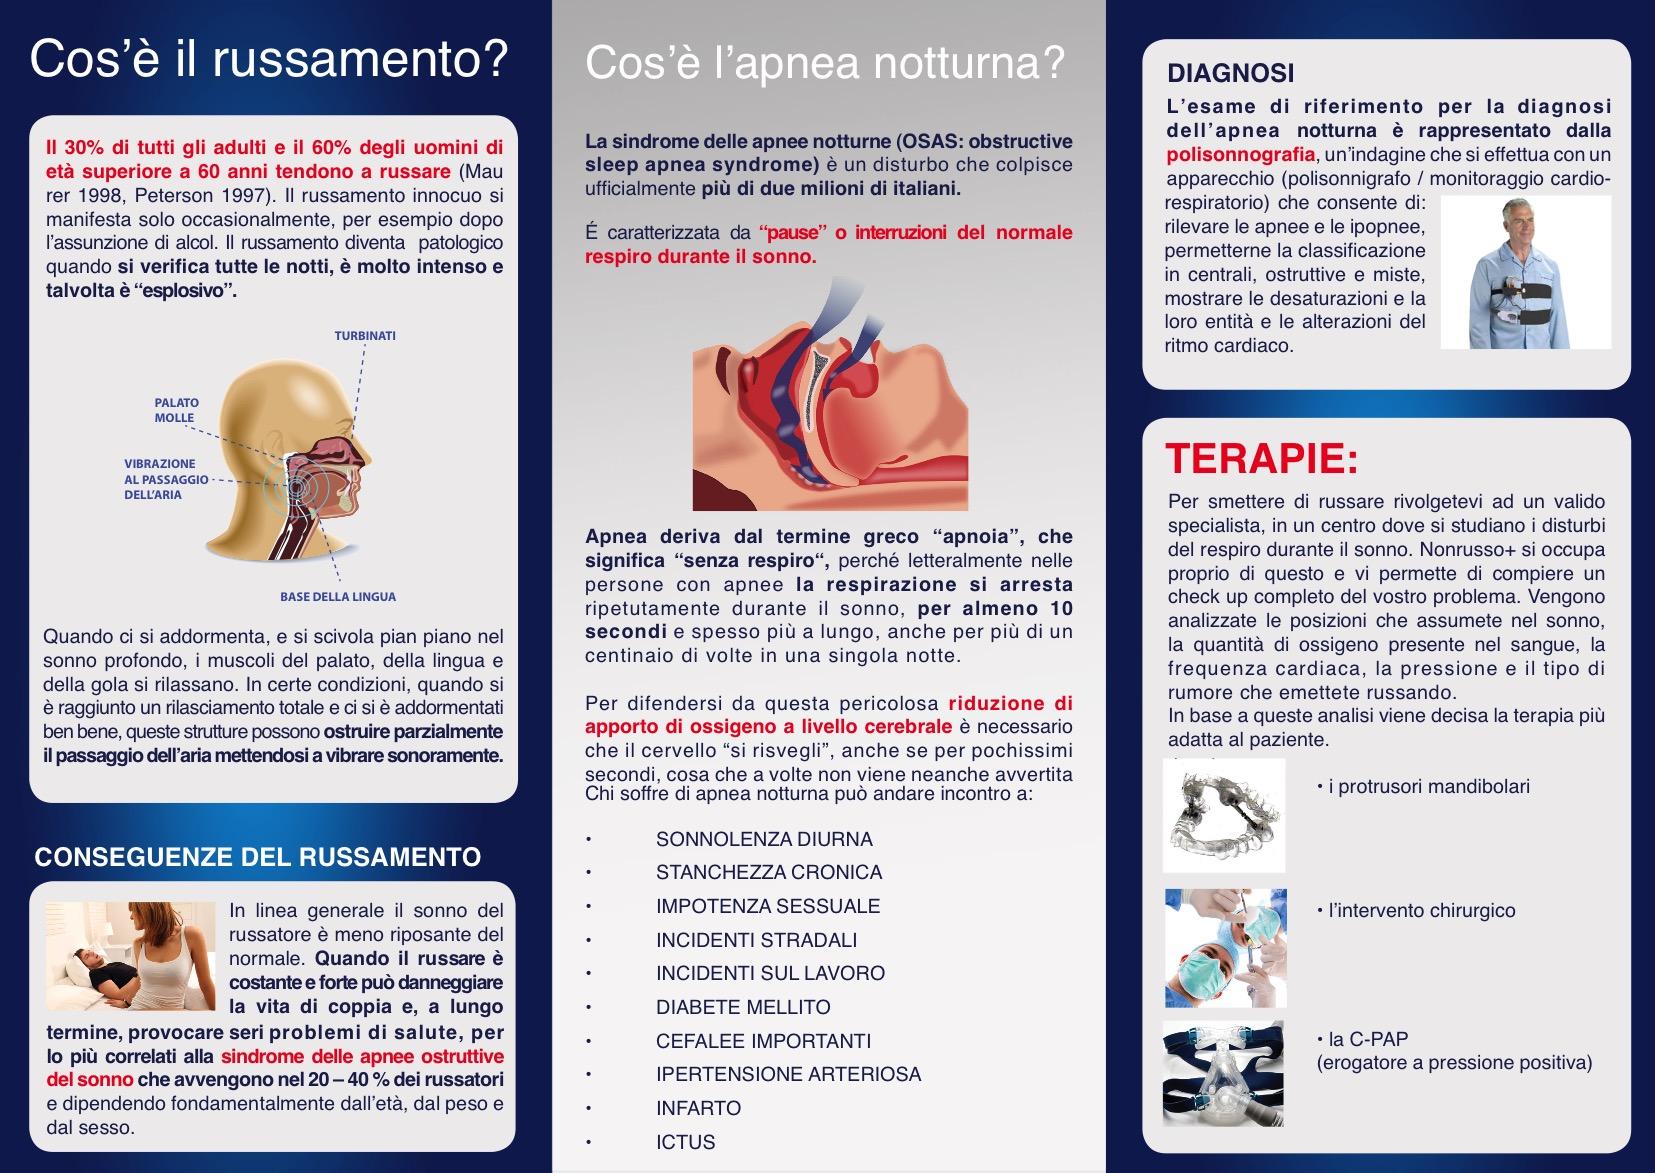 ARTICOLO OSAS PROTRUSOR 2_Page_2_Image_0001